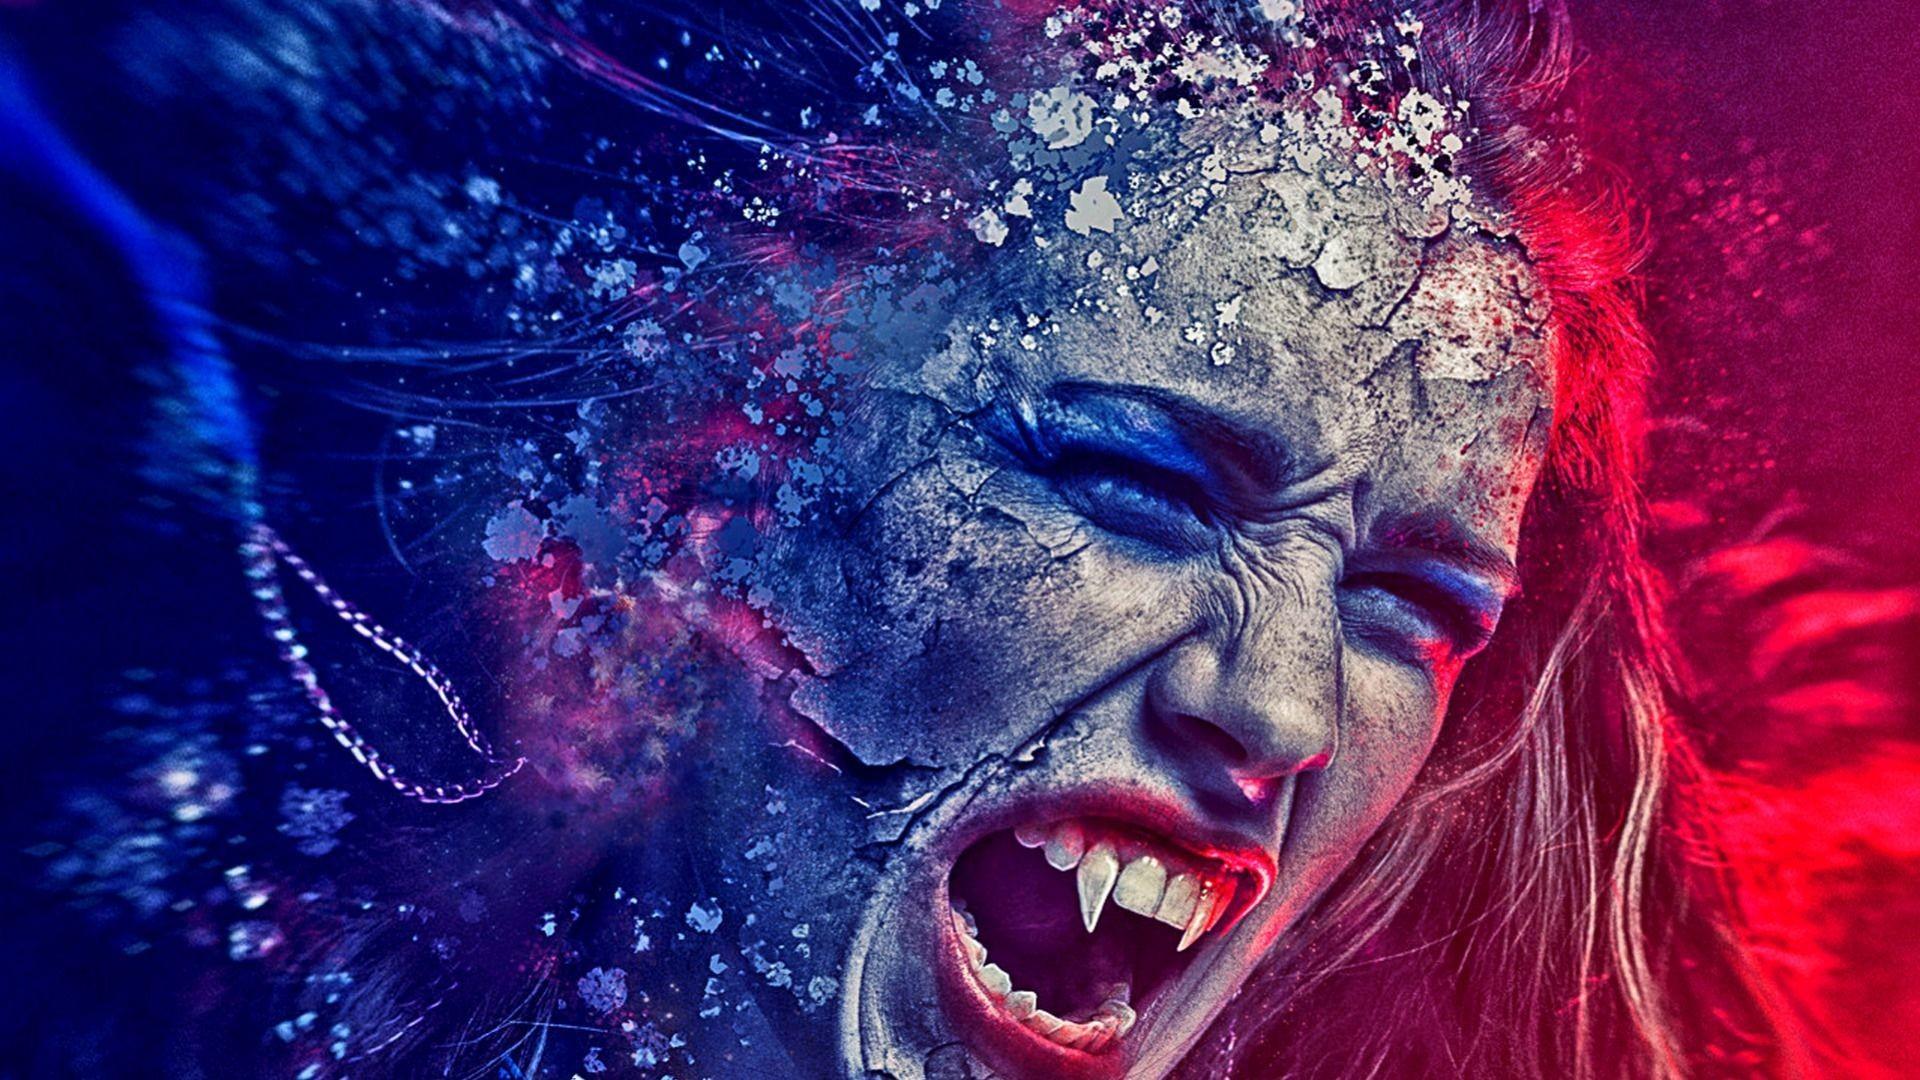 Angry female vampire wallpaper